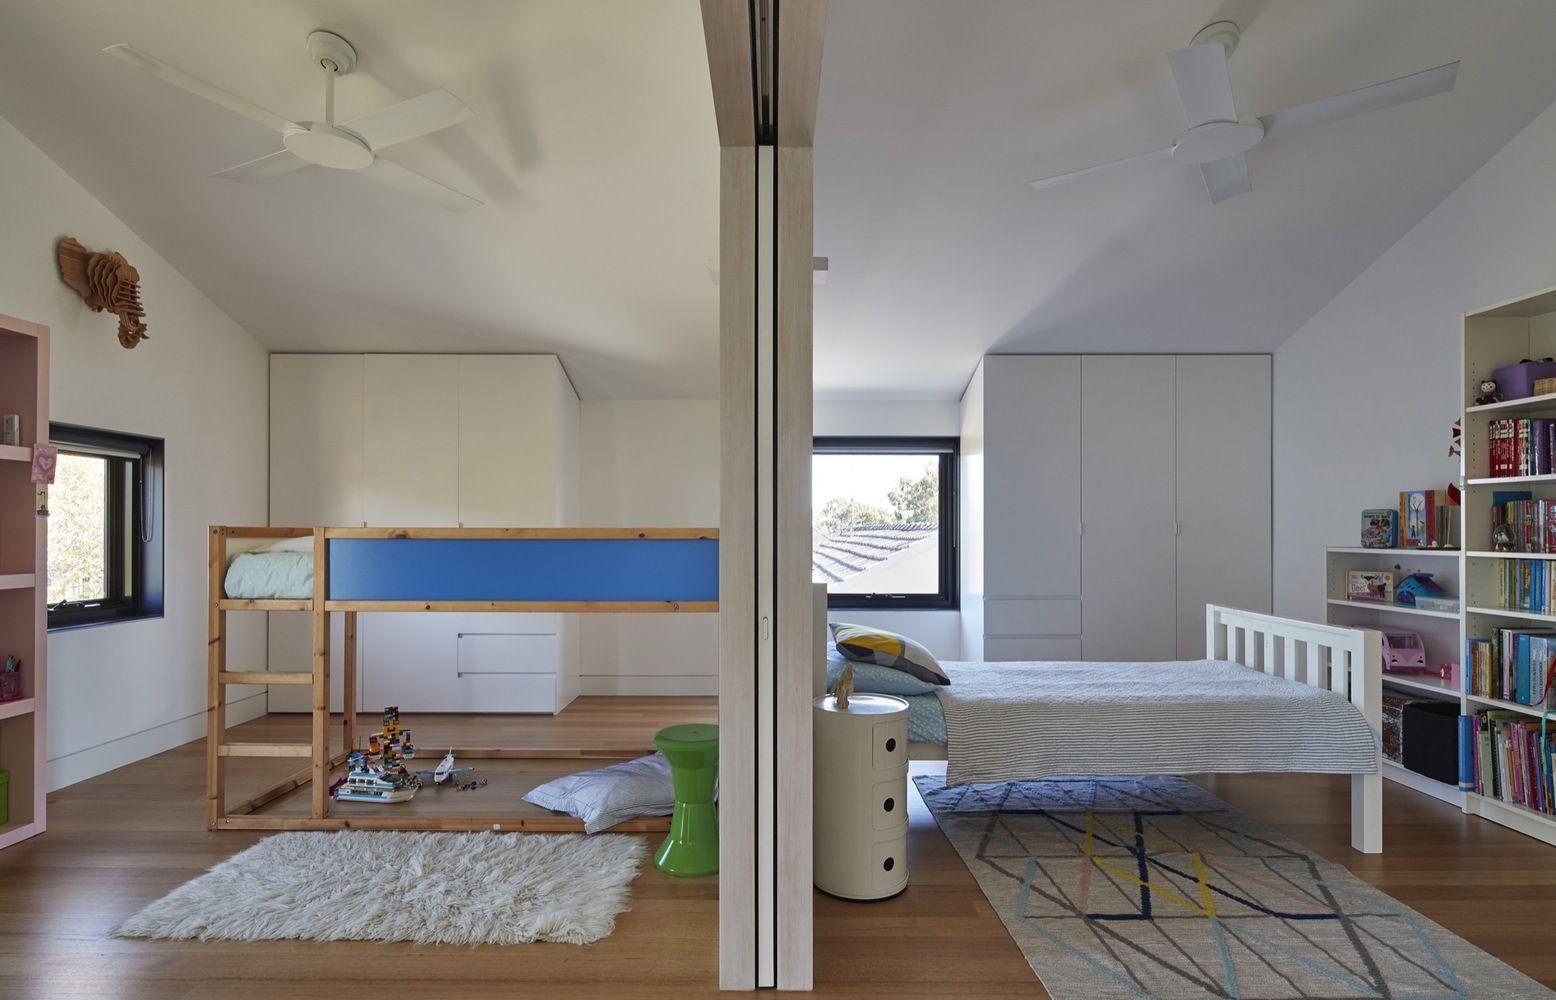 Gallery of Charles House / Austin Maynard Architects - 25 ...